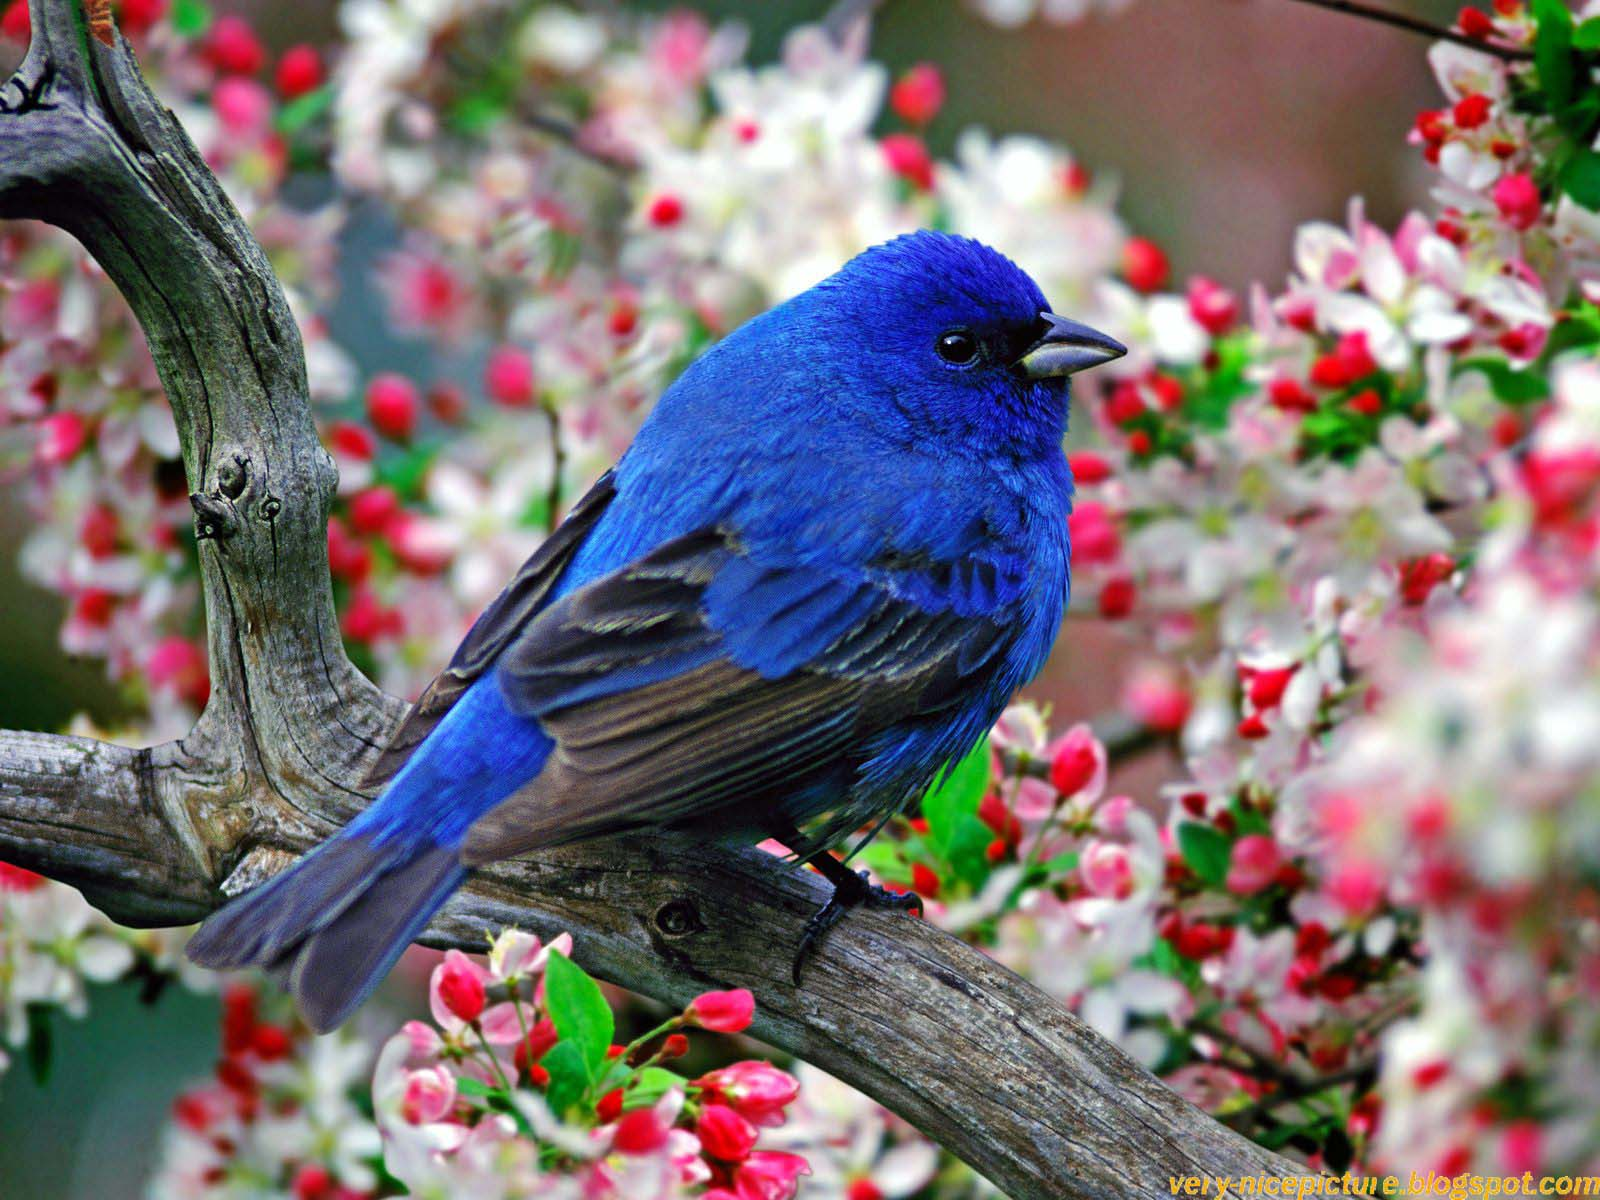 Kudla bluez nice wallpapers beautiful birds birds - Hd pics of nature with birds ...